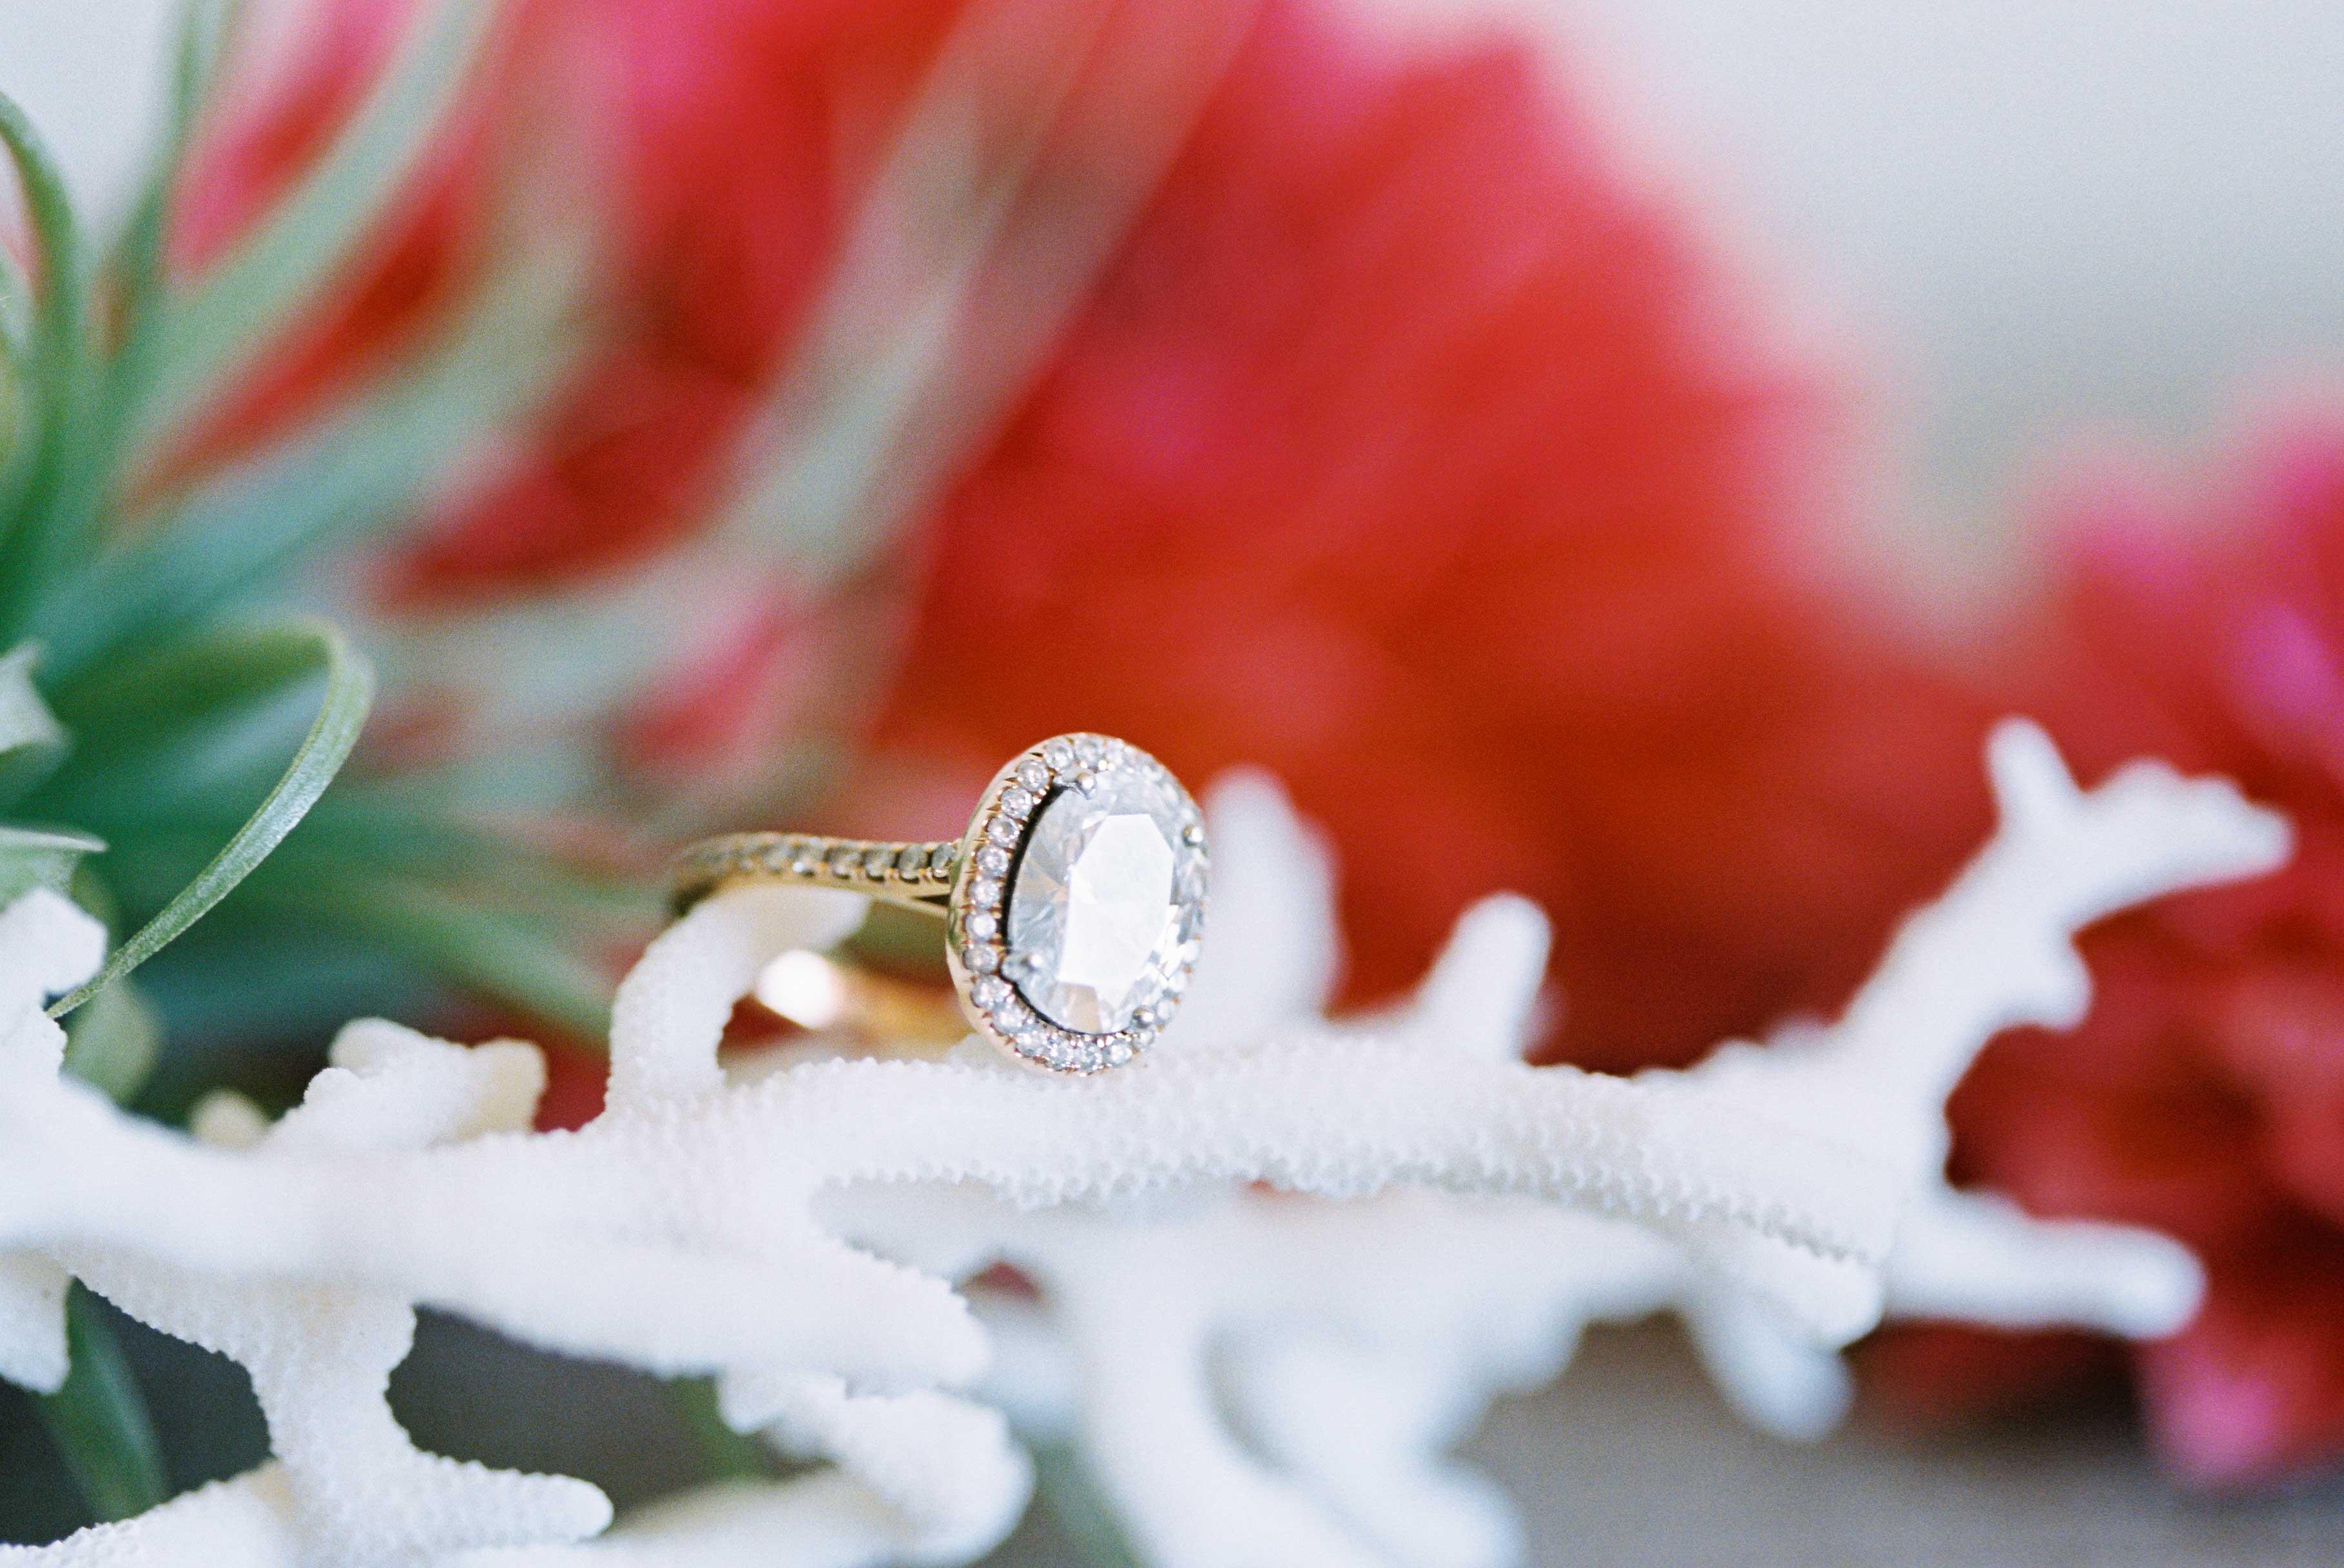 jesse plemons kirsten dunst engagement ring oval diamond yellow gold